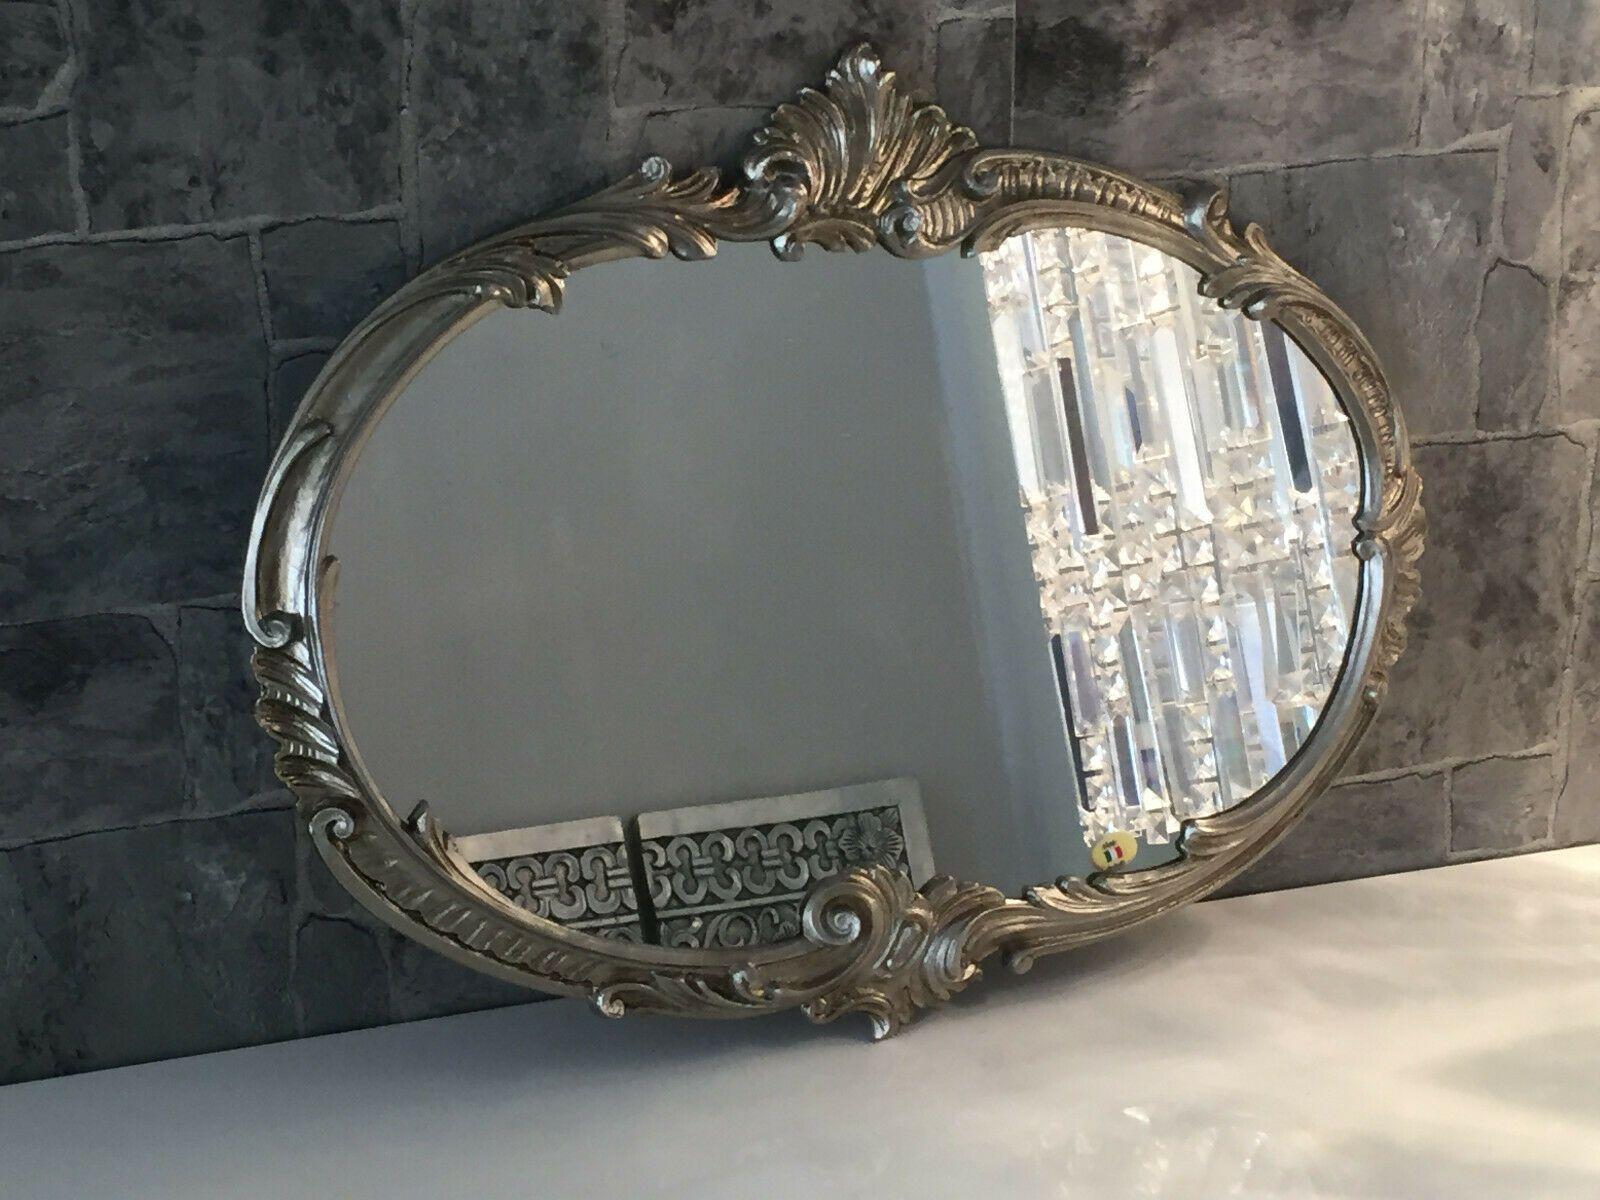 Wandspiegel Barock Oval Antik Silber 52x42 Badspiegel Vintage Ovaler Spiegel Wohnwelten Shop De In 2020 Badspiegel Ovaler Spiegel Barock Spiegel